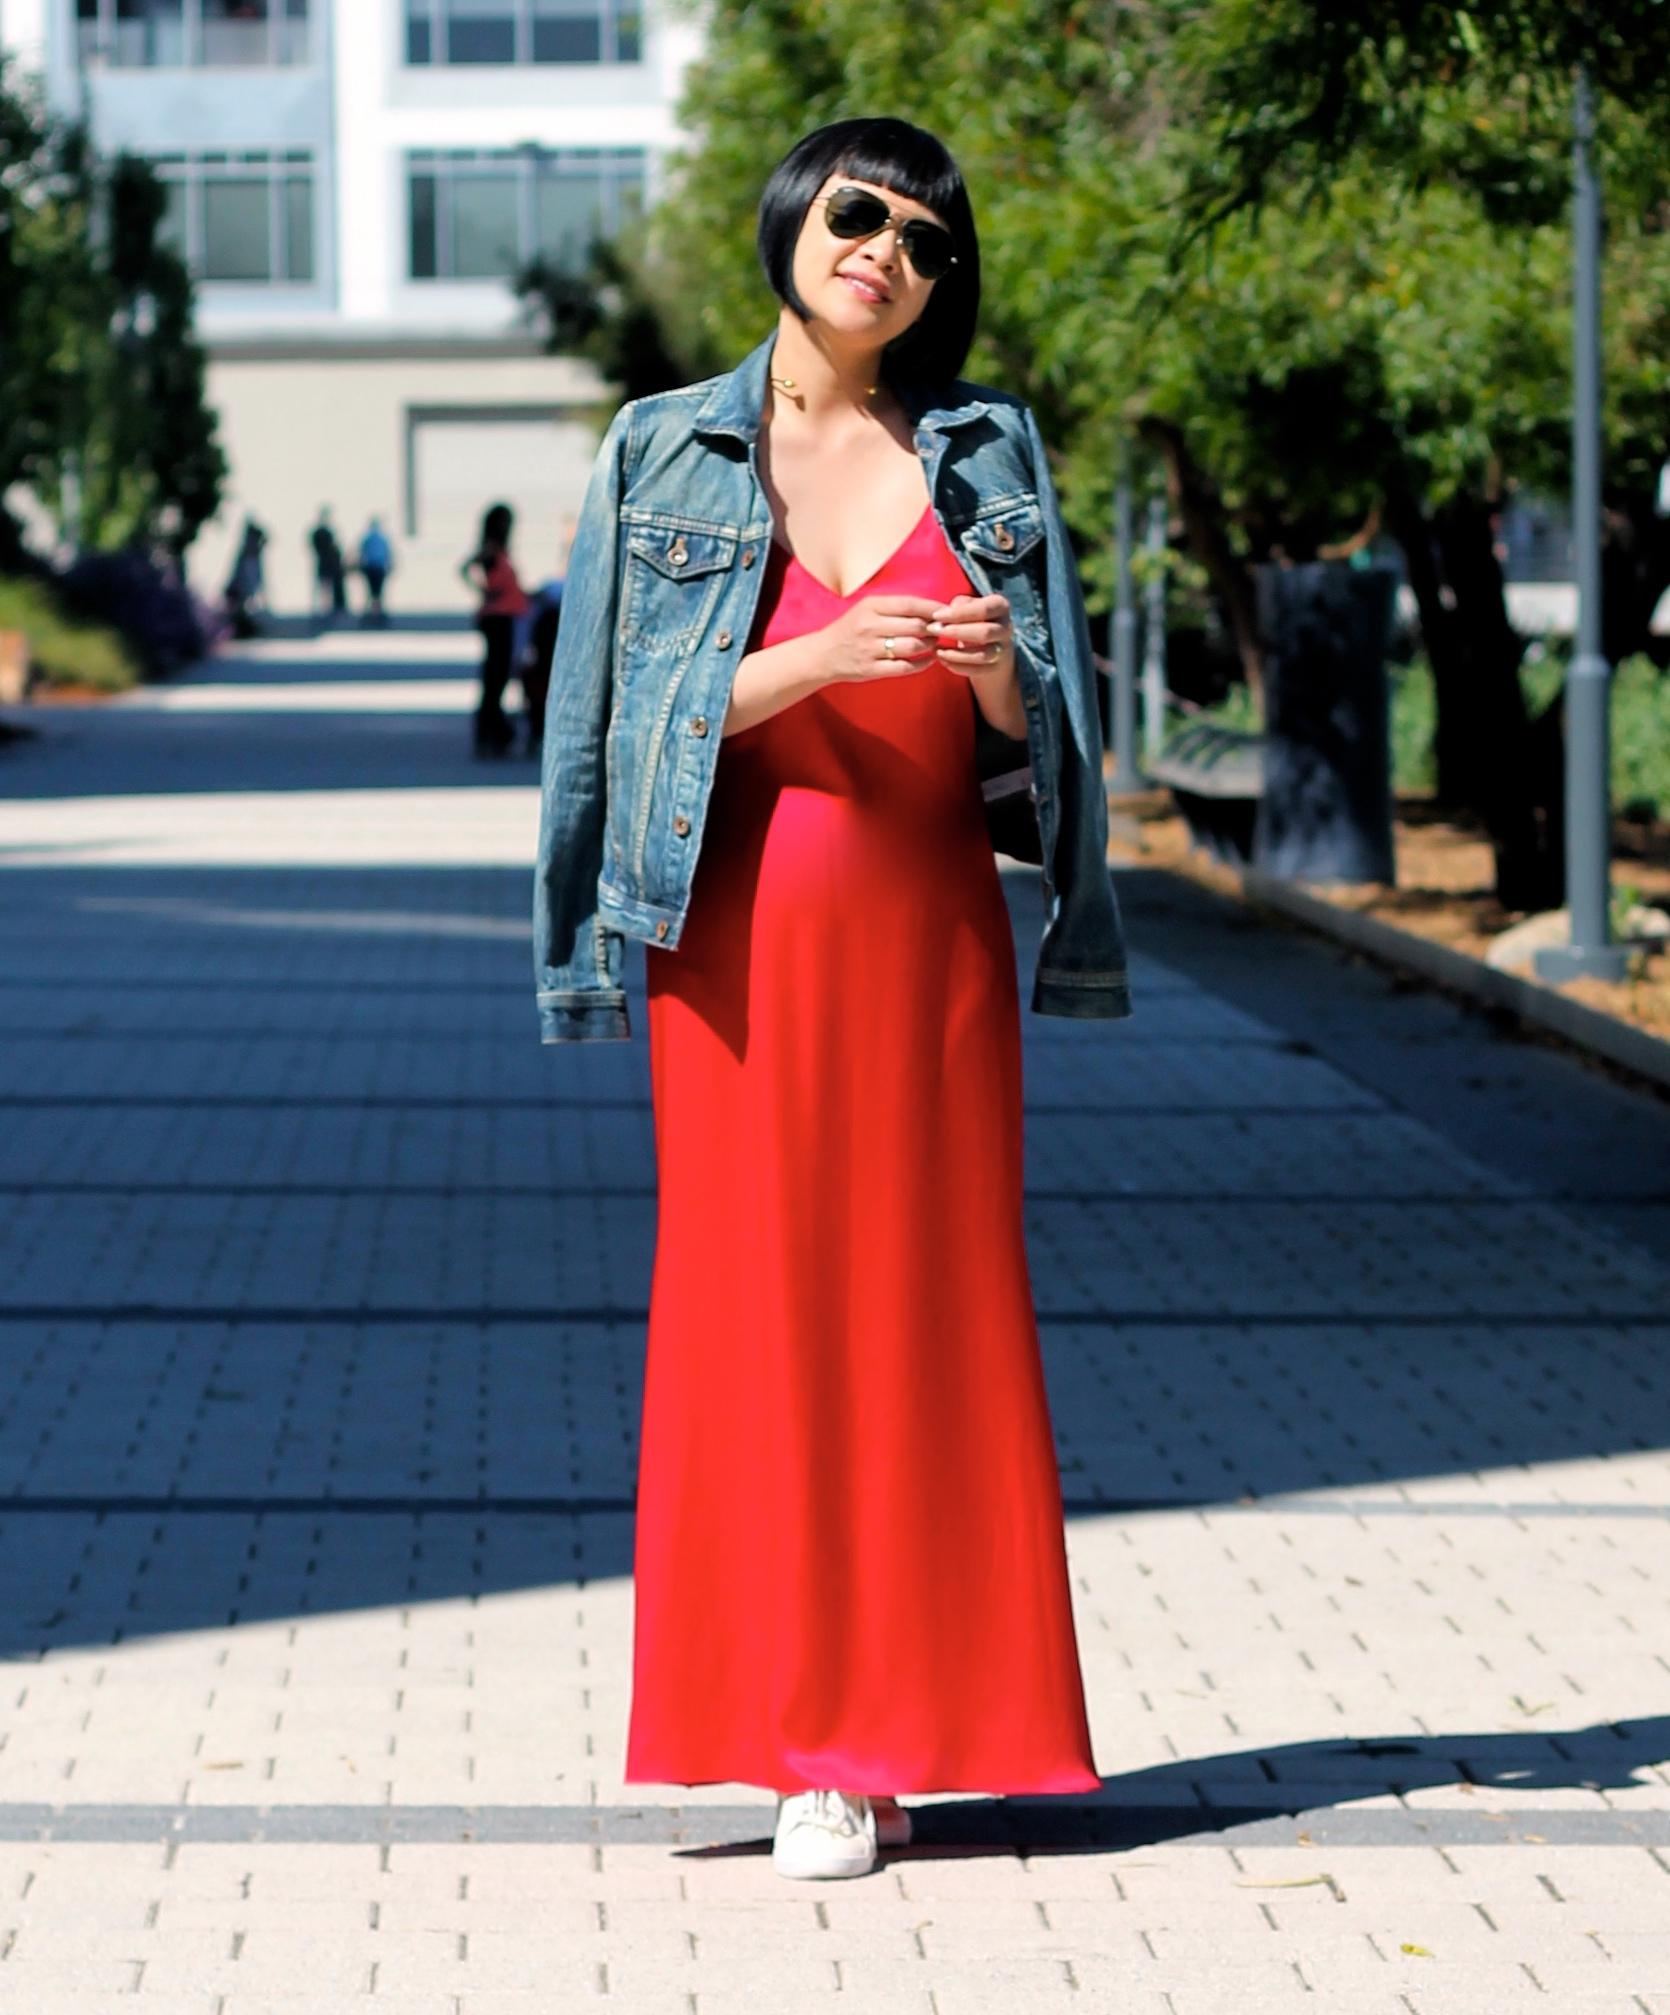 Madewell denim jacket, Reformation dress, Puma shoes, Ray-Ban sunglasses, Svelte Metals necklace